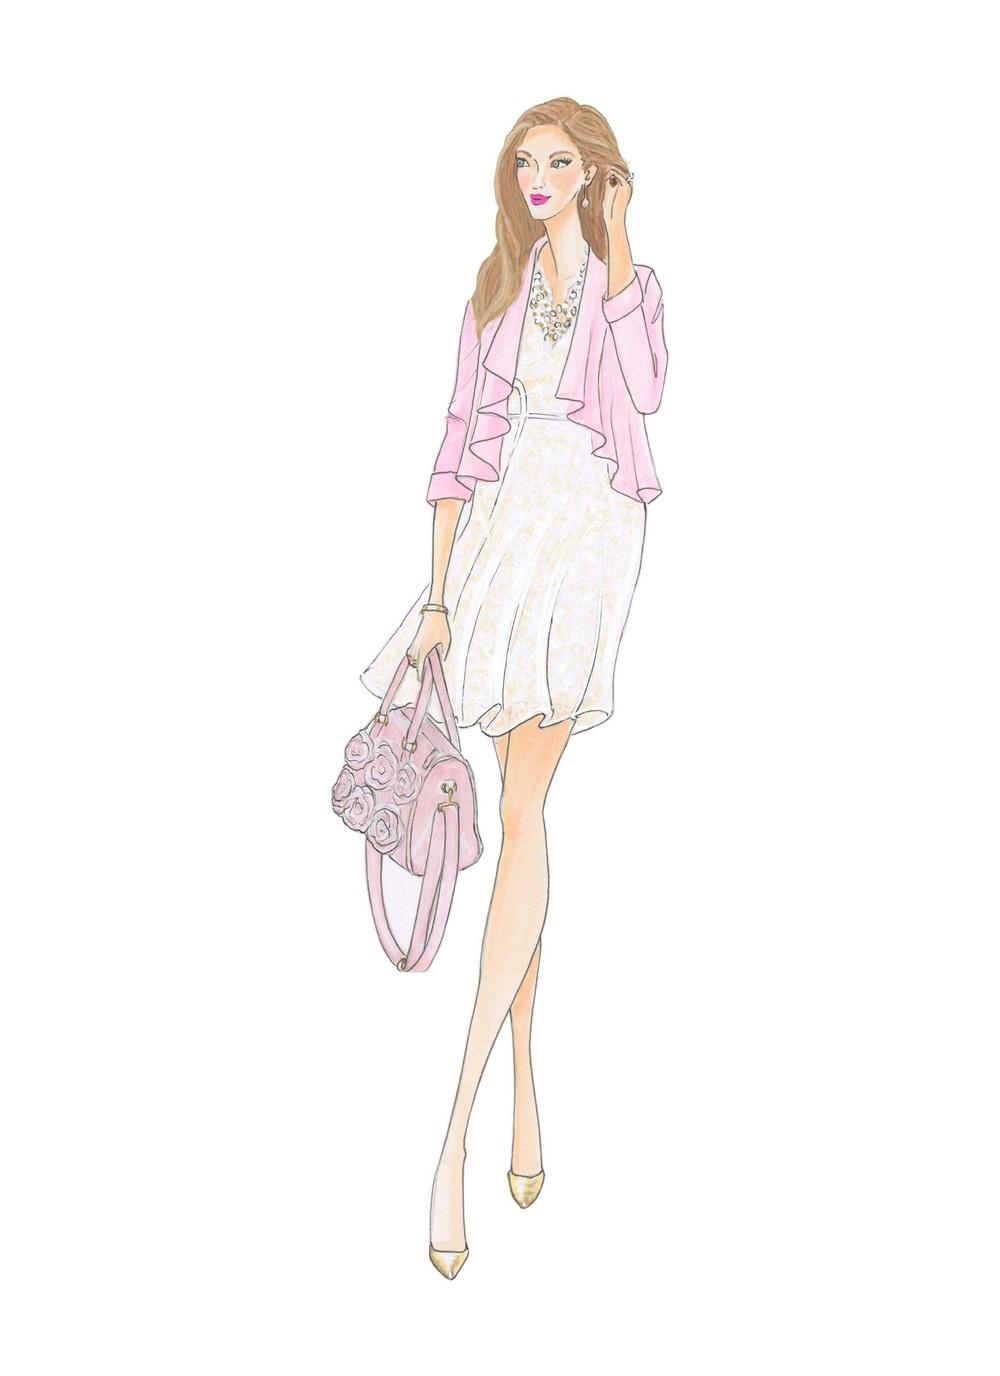 M. Michael Illustration- Enchanting Elegance